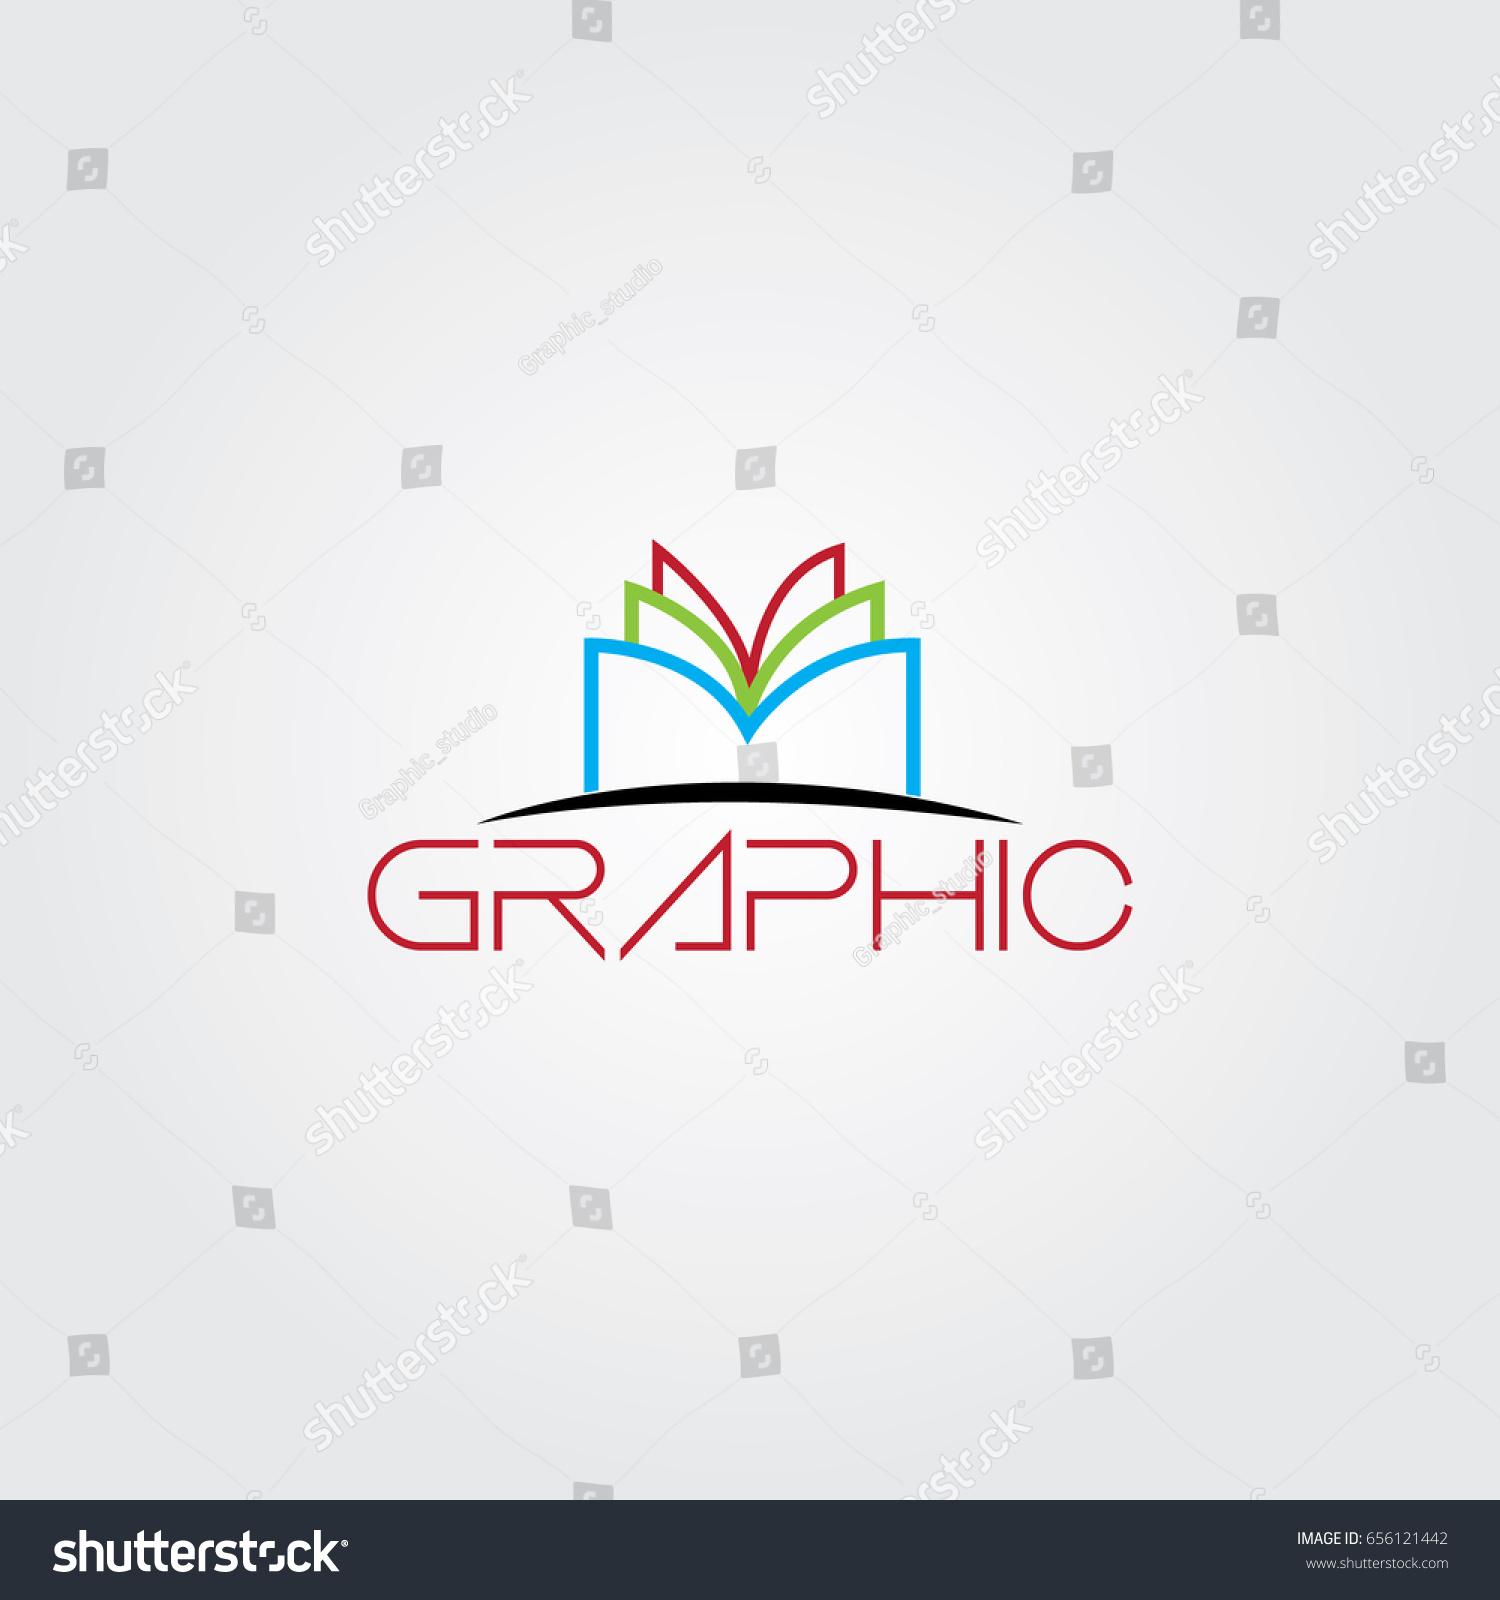 Creative Book Design Vector : Creative logo design unique symbol book stock vector